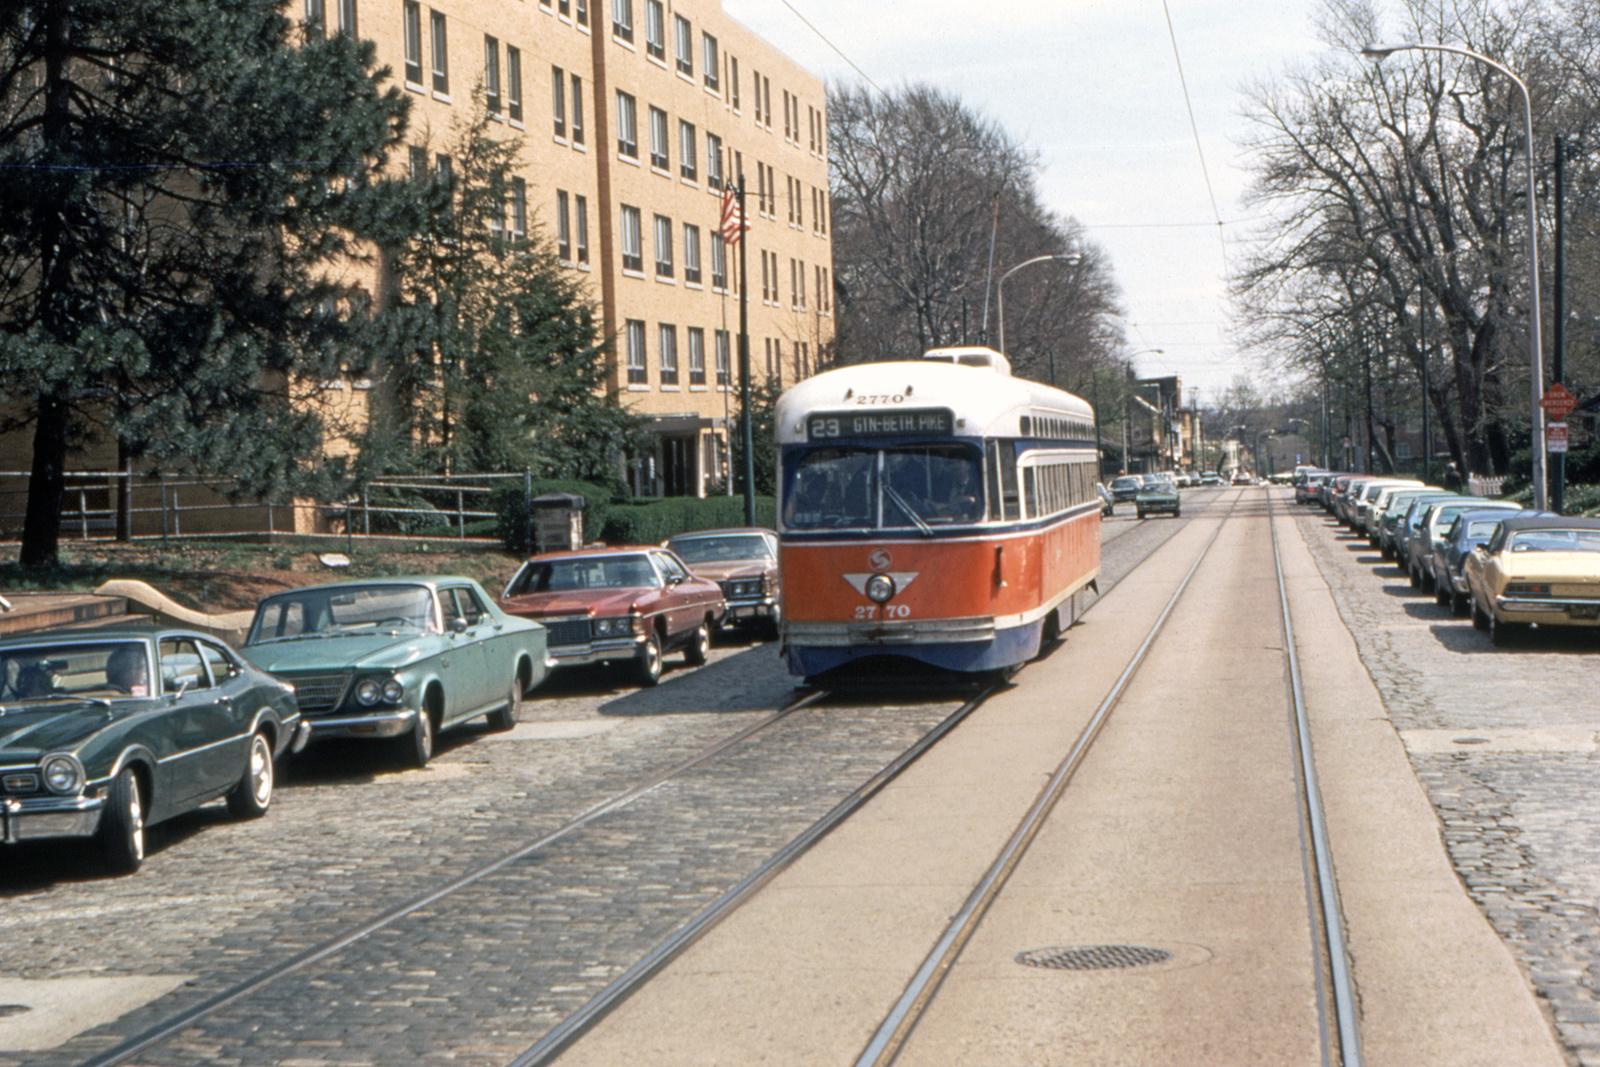 (873k, 1600x1067)<br><b>Country:</b> United States<br><b>City:</b> Philadelphia, PA<br><b>System:</b> SEPTA (or Predecessor)<br><b>Line:</b> Rt. 23-Germantown<br><b>Location:</b> Germantown/Upsal<br><b>Car:</b> PTC/SEPTA Postwar All-electric PCC (St.Louis, 1947) 2770 <br><b>Collection of:</b> David Pirmann<br><b>Viewed (this week/total):</b> 0 / 77